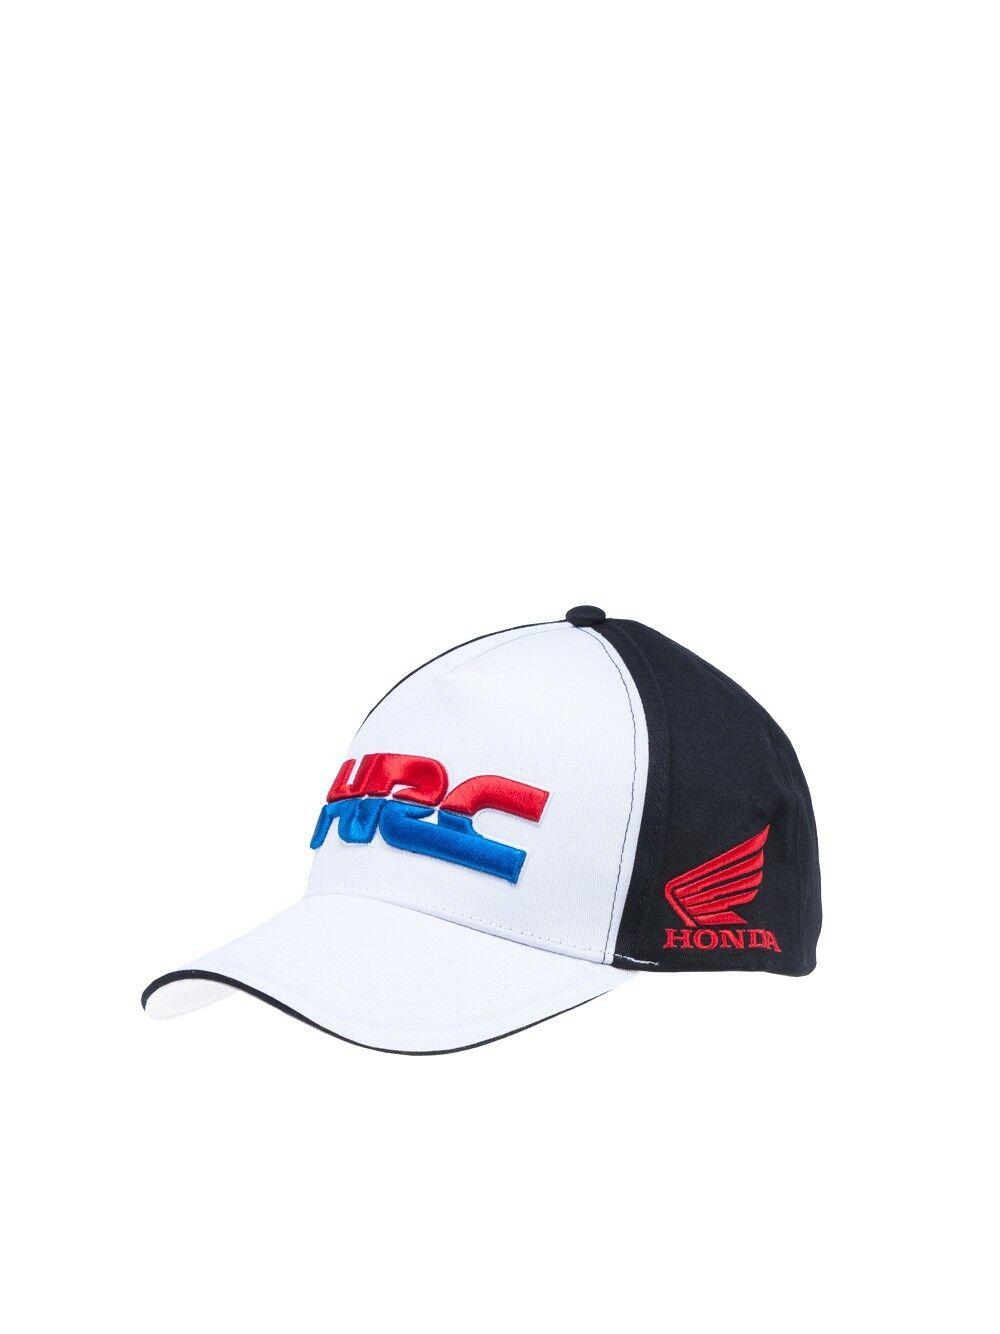 Officielle Hrc (Honda Course Corp Casquette Baseball - 17 48002